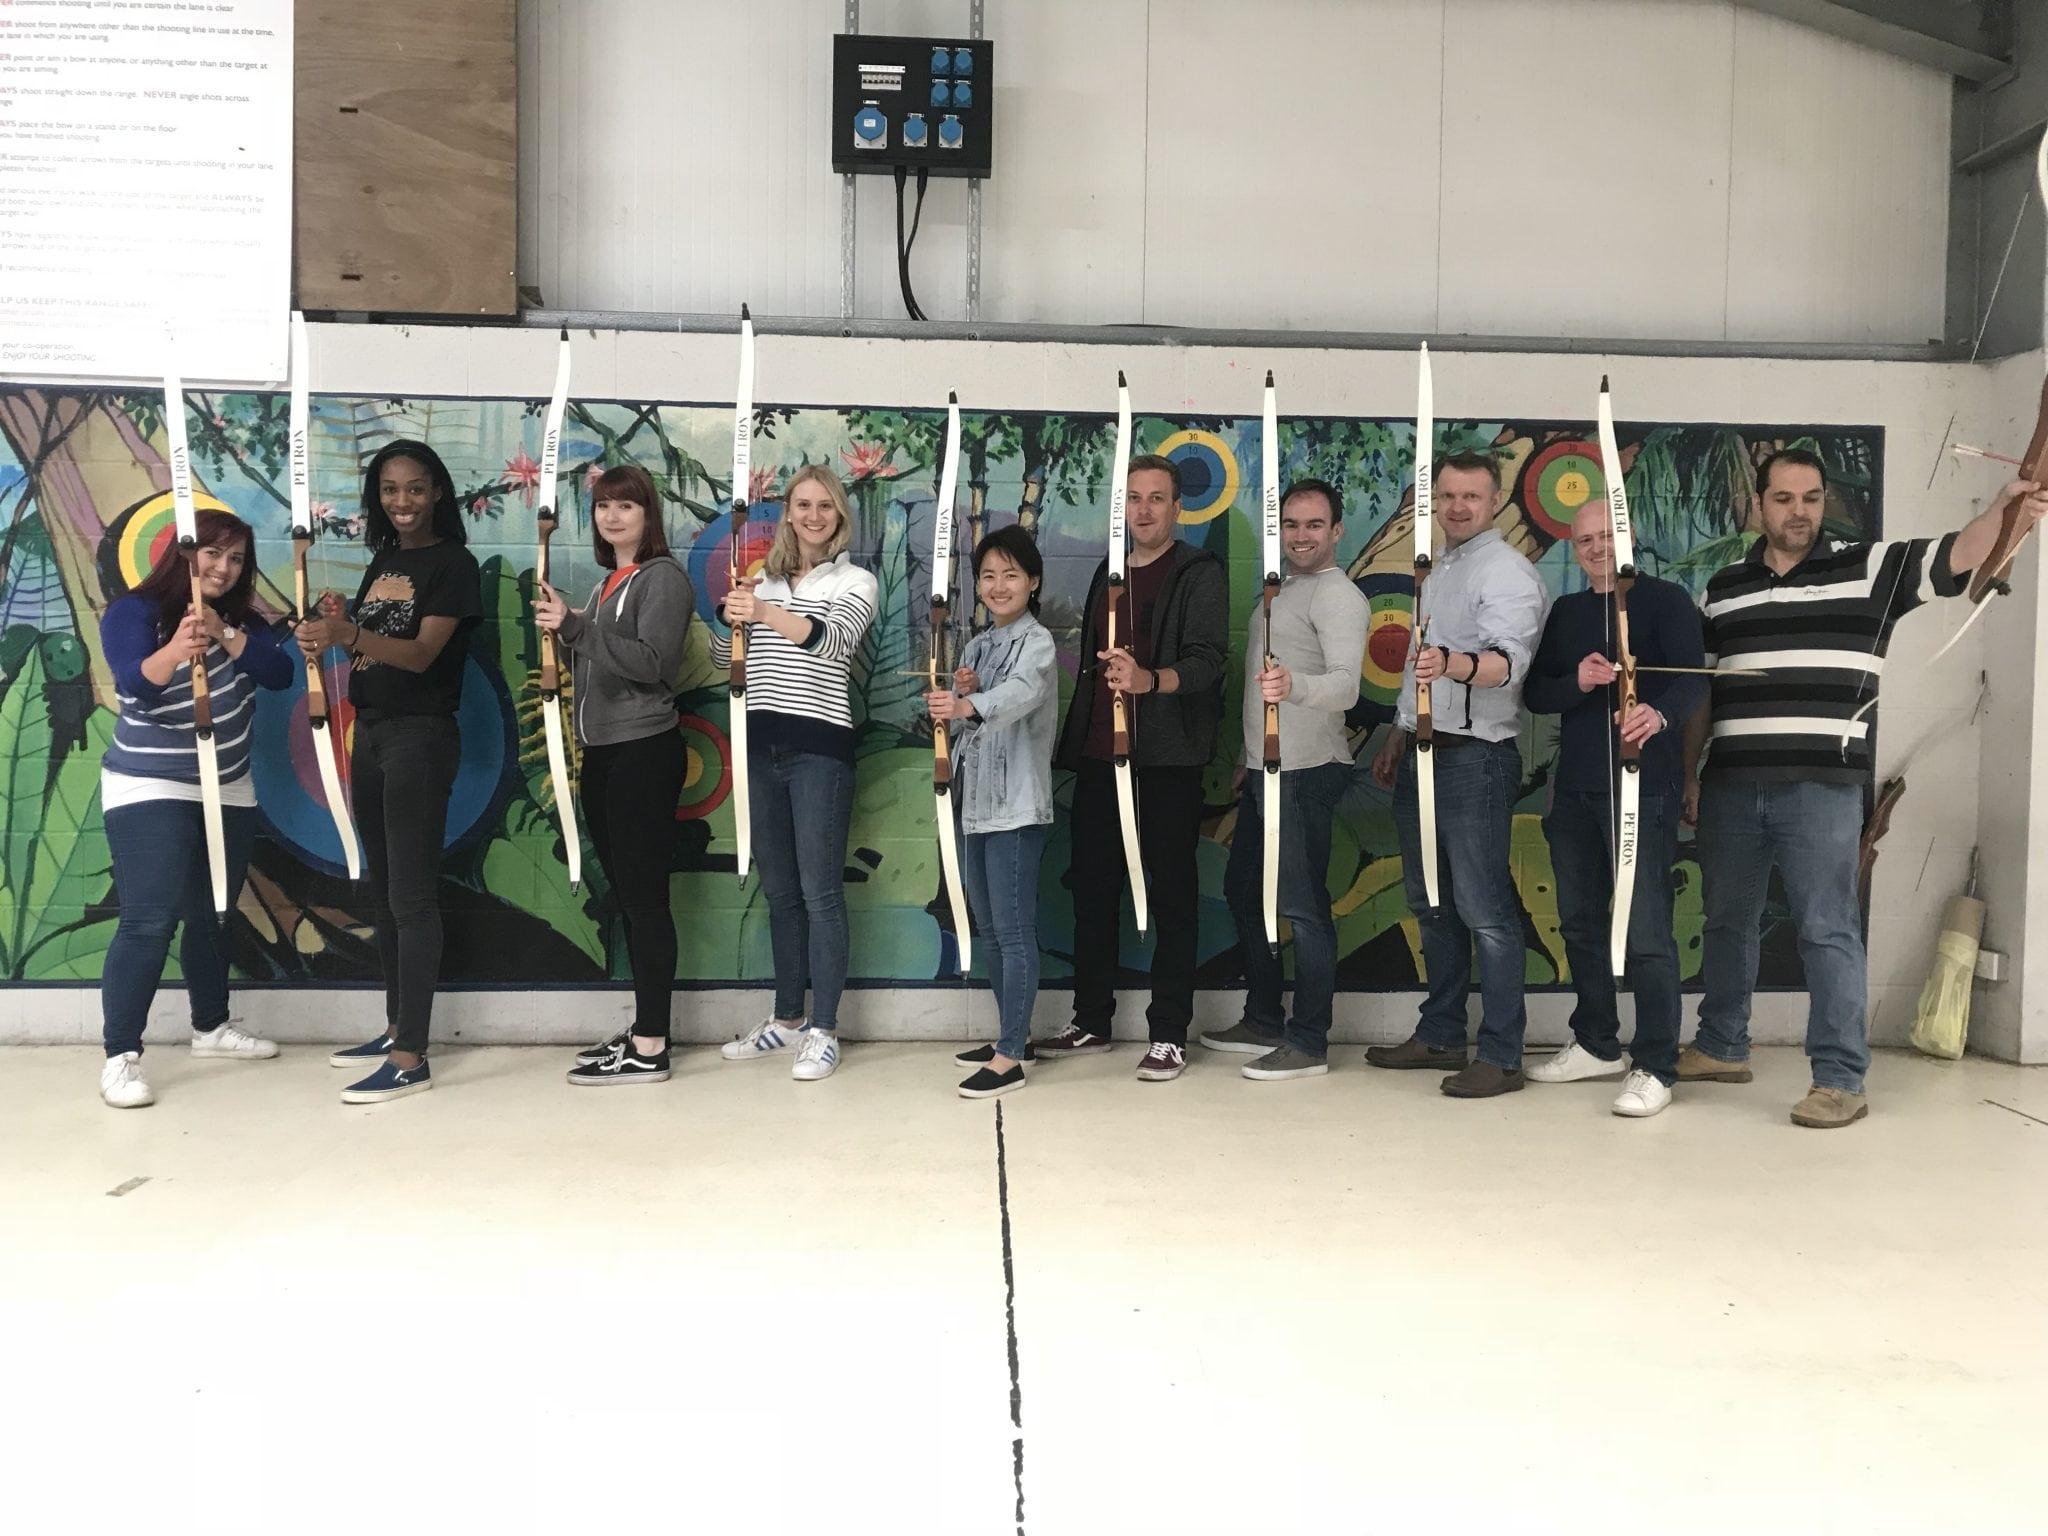 Archery Taster Experience